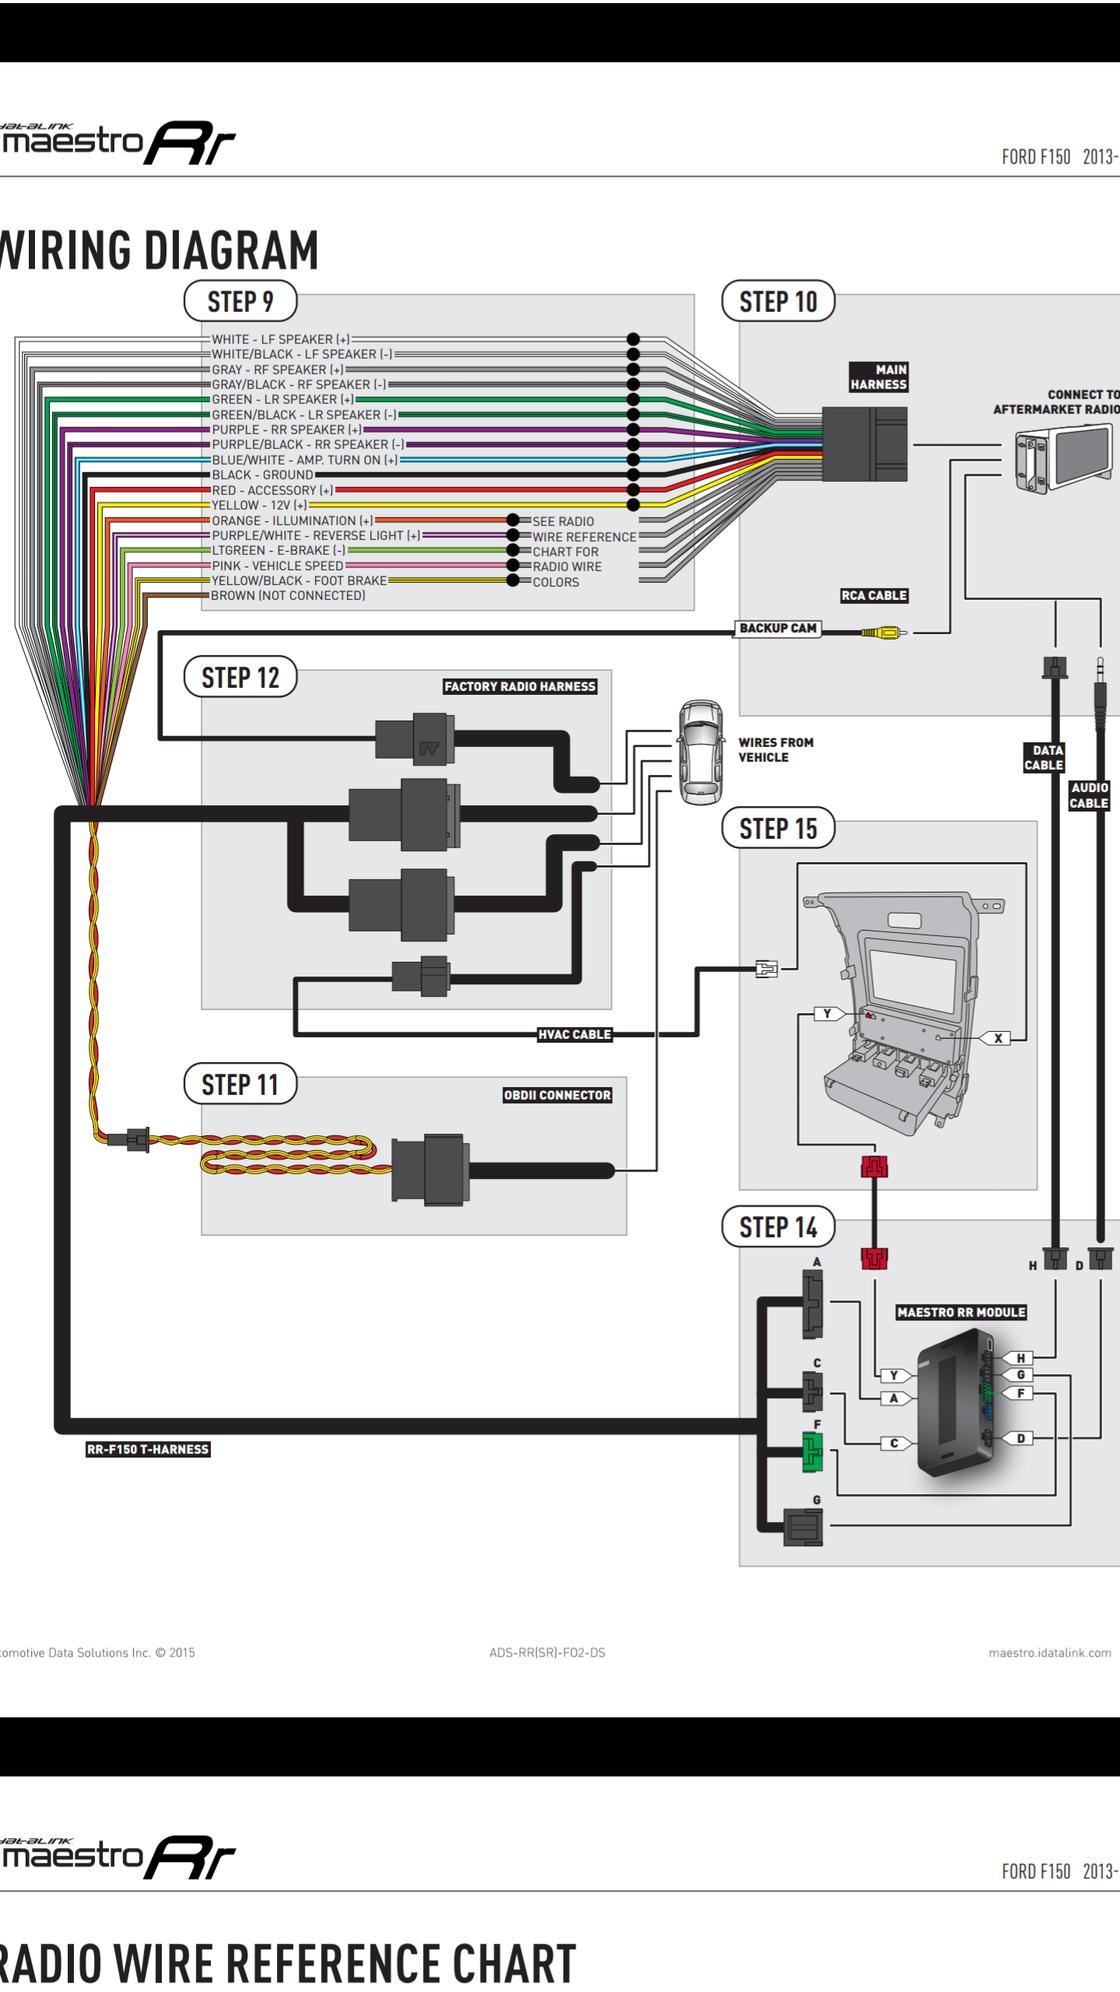 on idatalink maestro rr wiring diagram scion